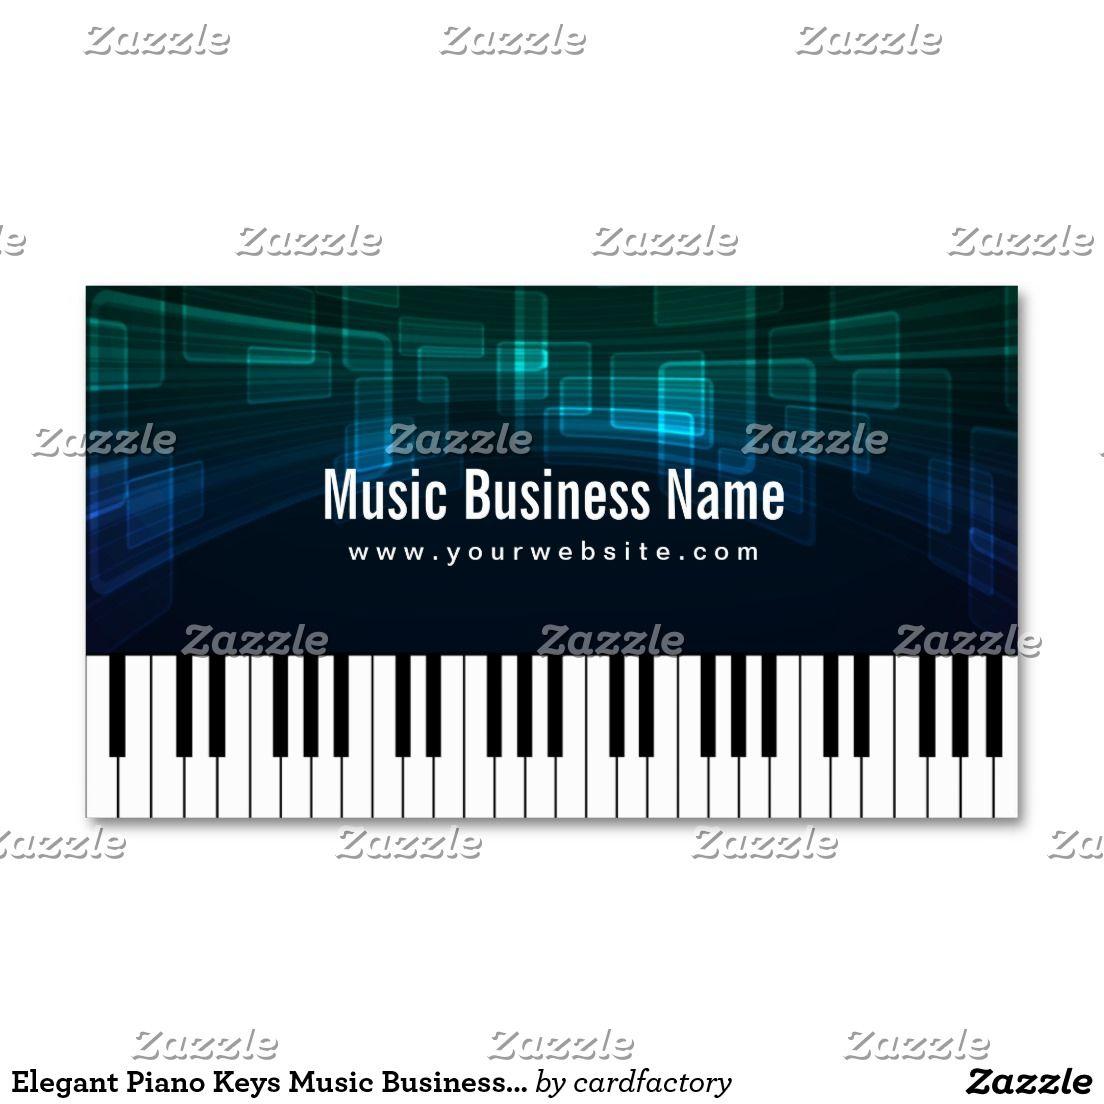 Elegant Piano Keys Music Business Card   Piano lessons   Pinterest ...